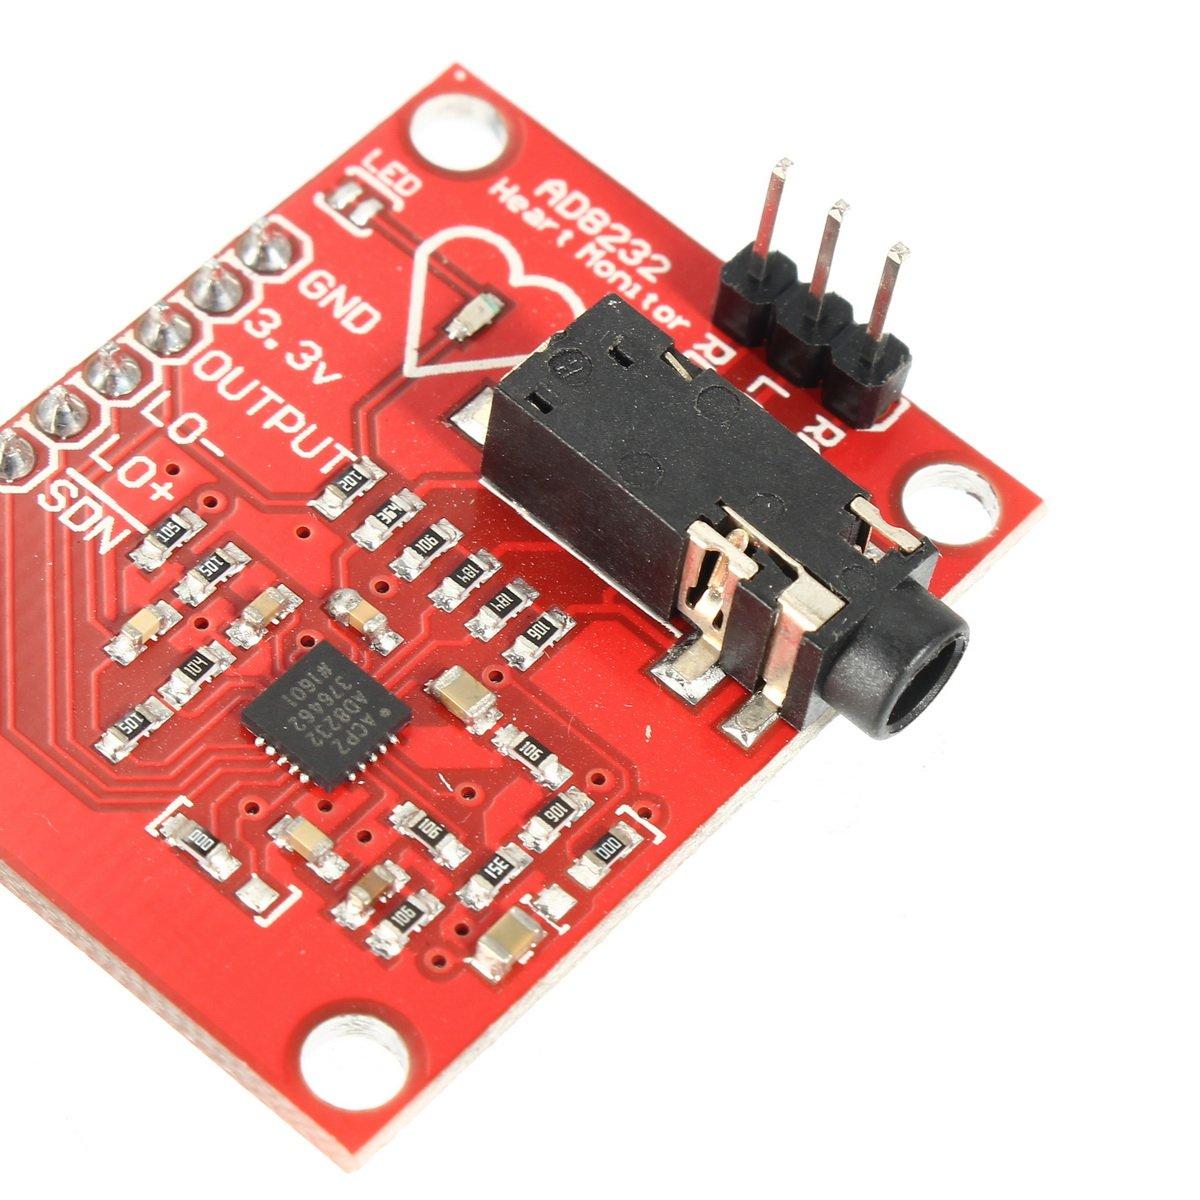 ILS DC 3.3V AD8232 ECG Measurement Module Kit Portable Heart Monitor Biological